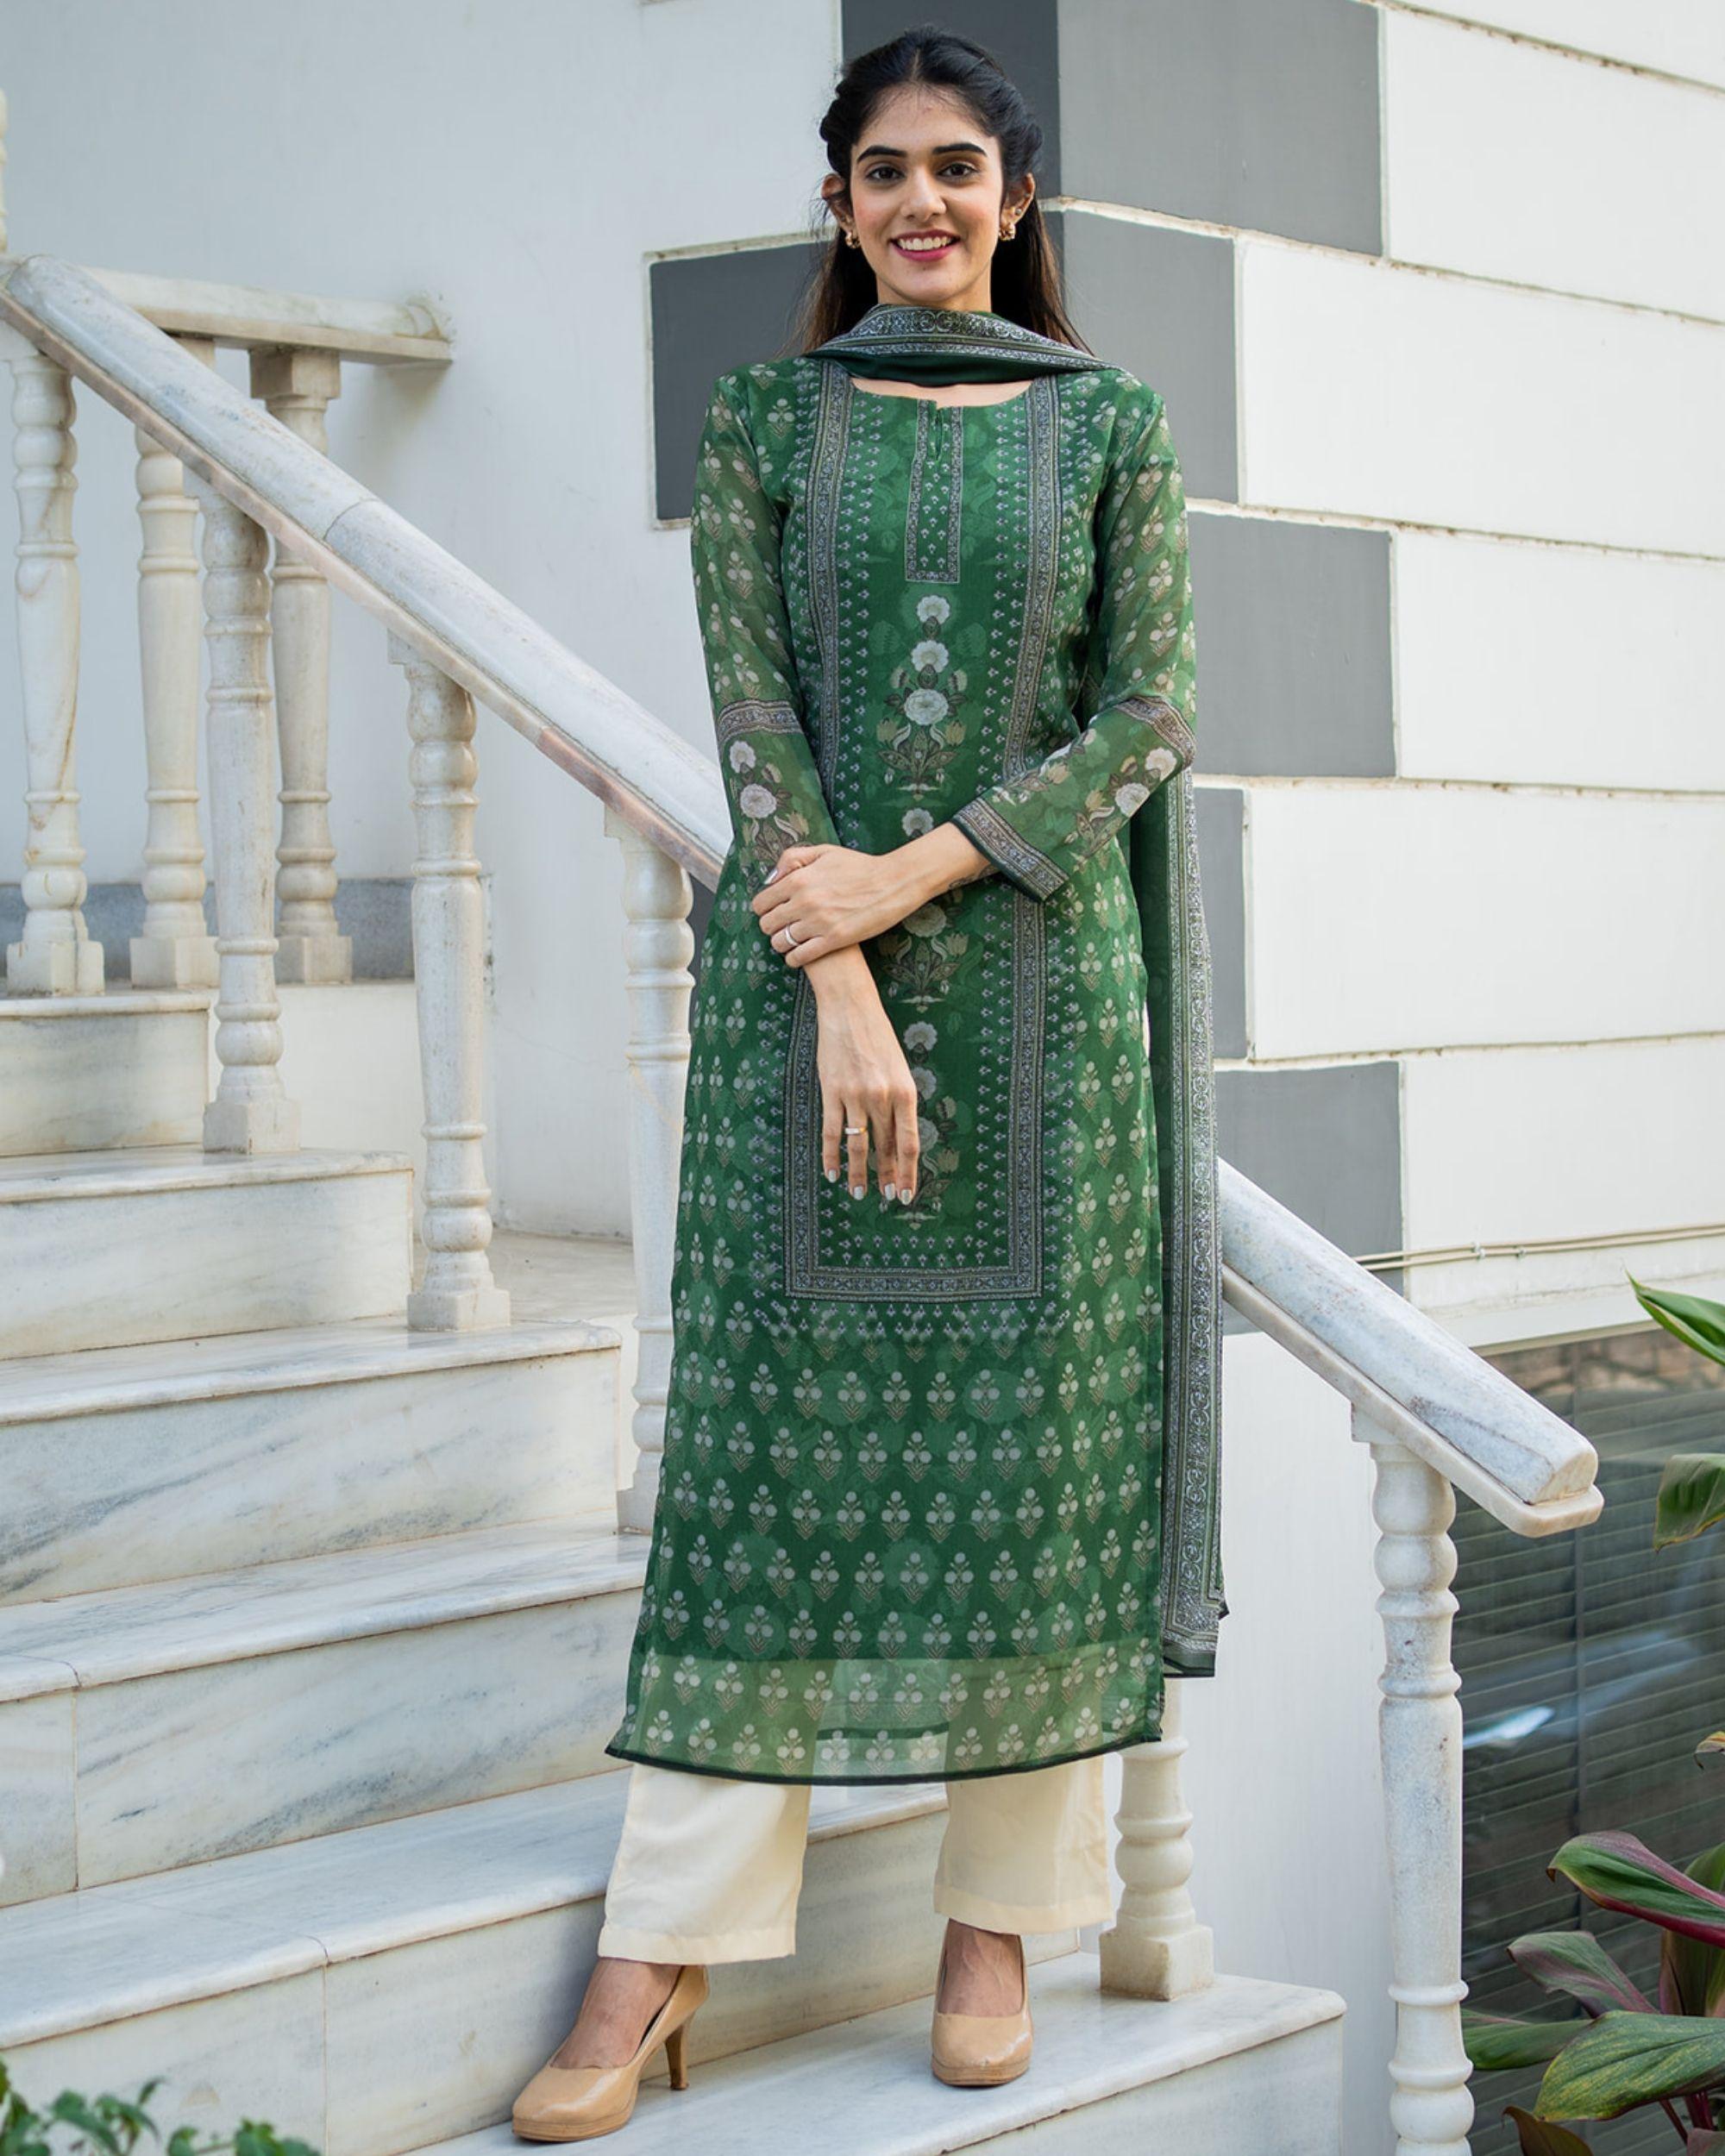 Green yoke suit set with dupatta - set of three